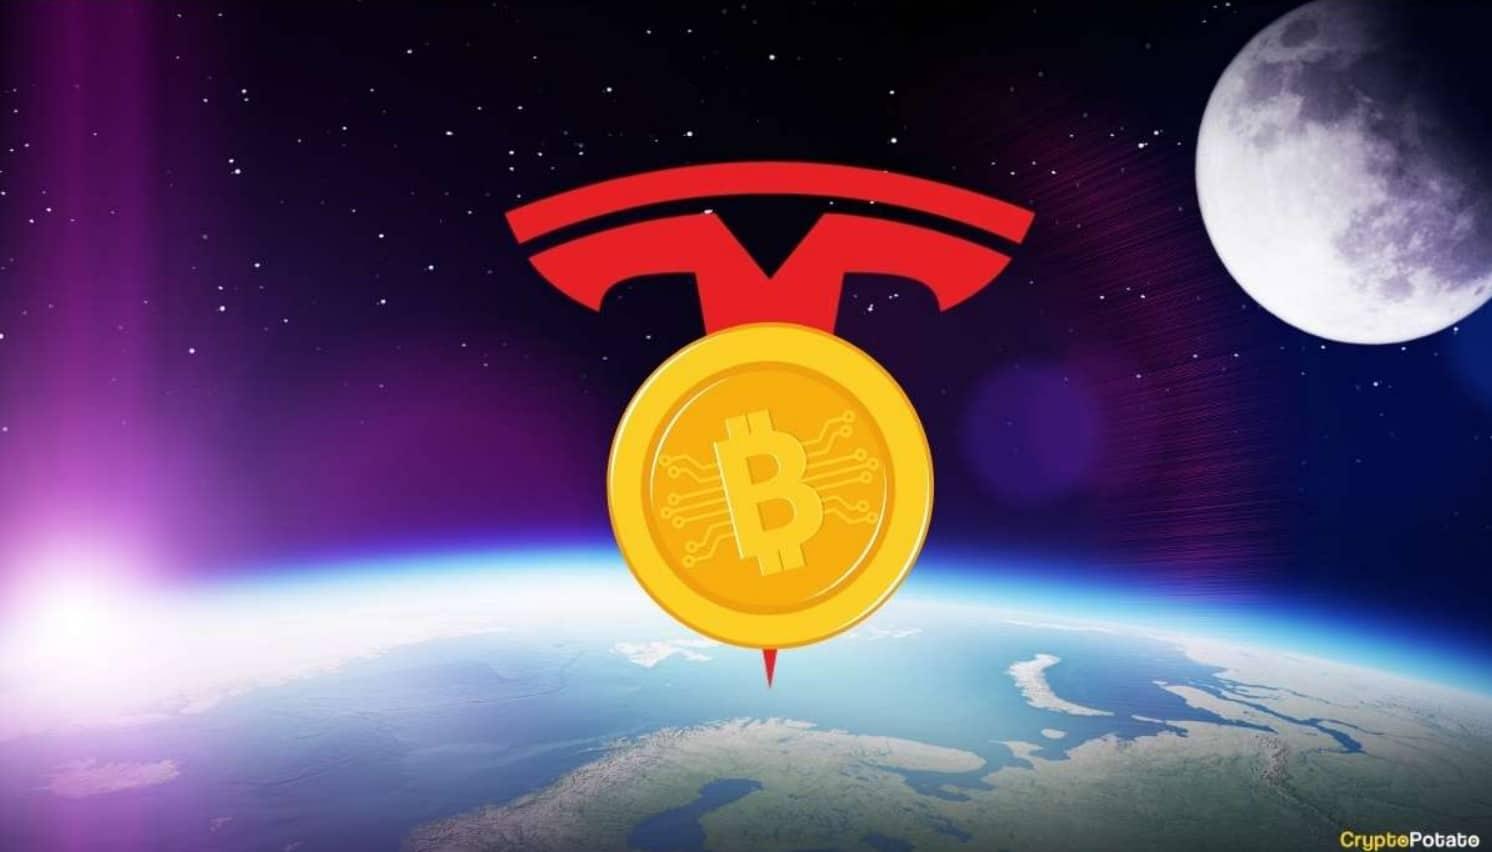 Breaking: Tesla Bought $1.5 Billion of Bitcoin – BTC Skyrockets to New ATH